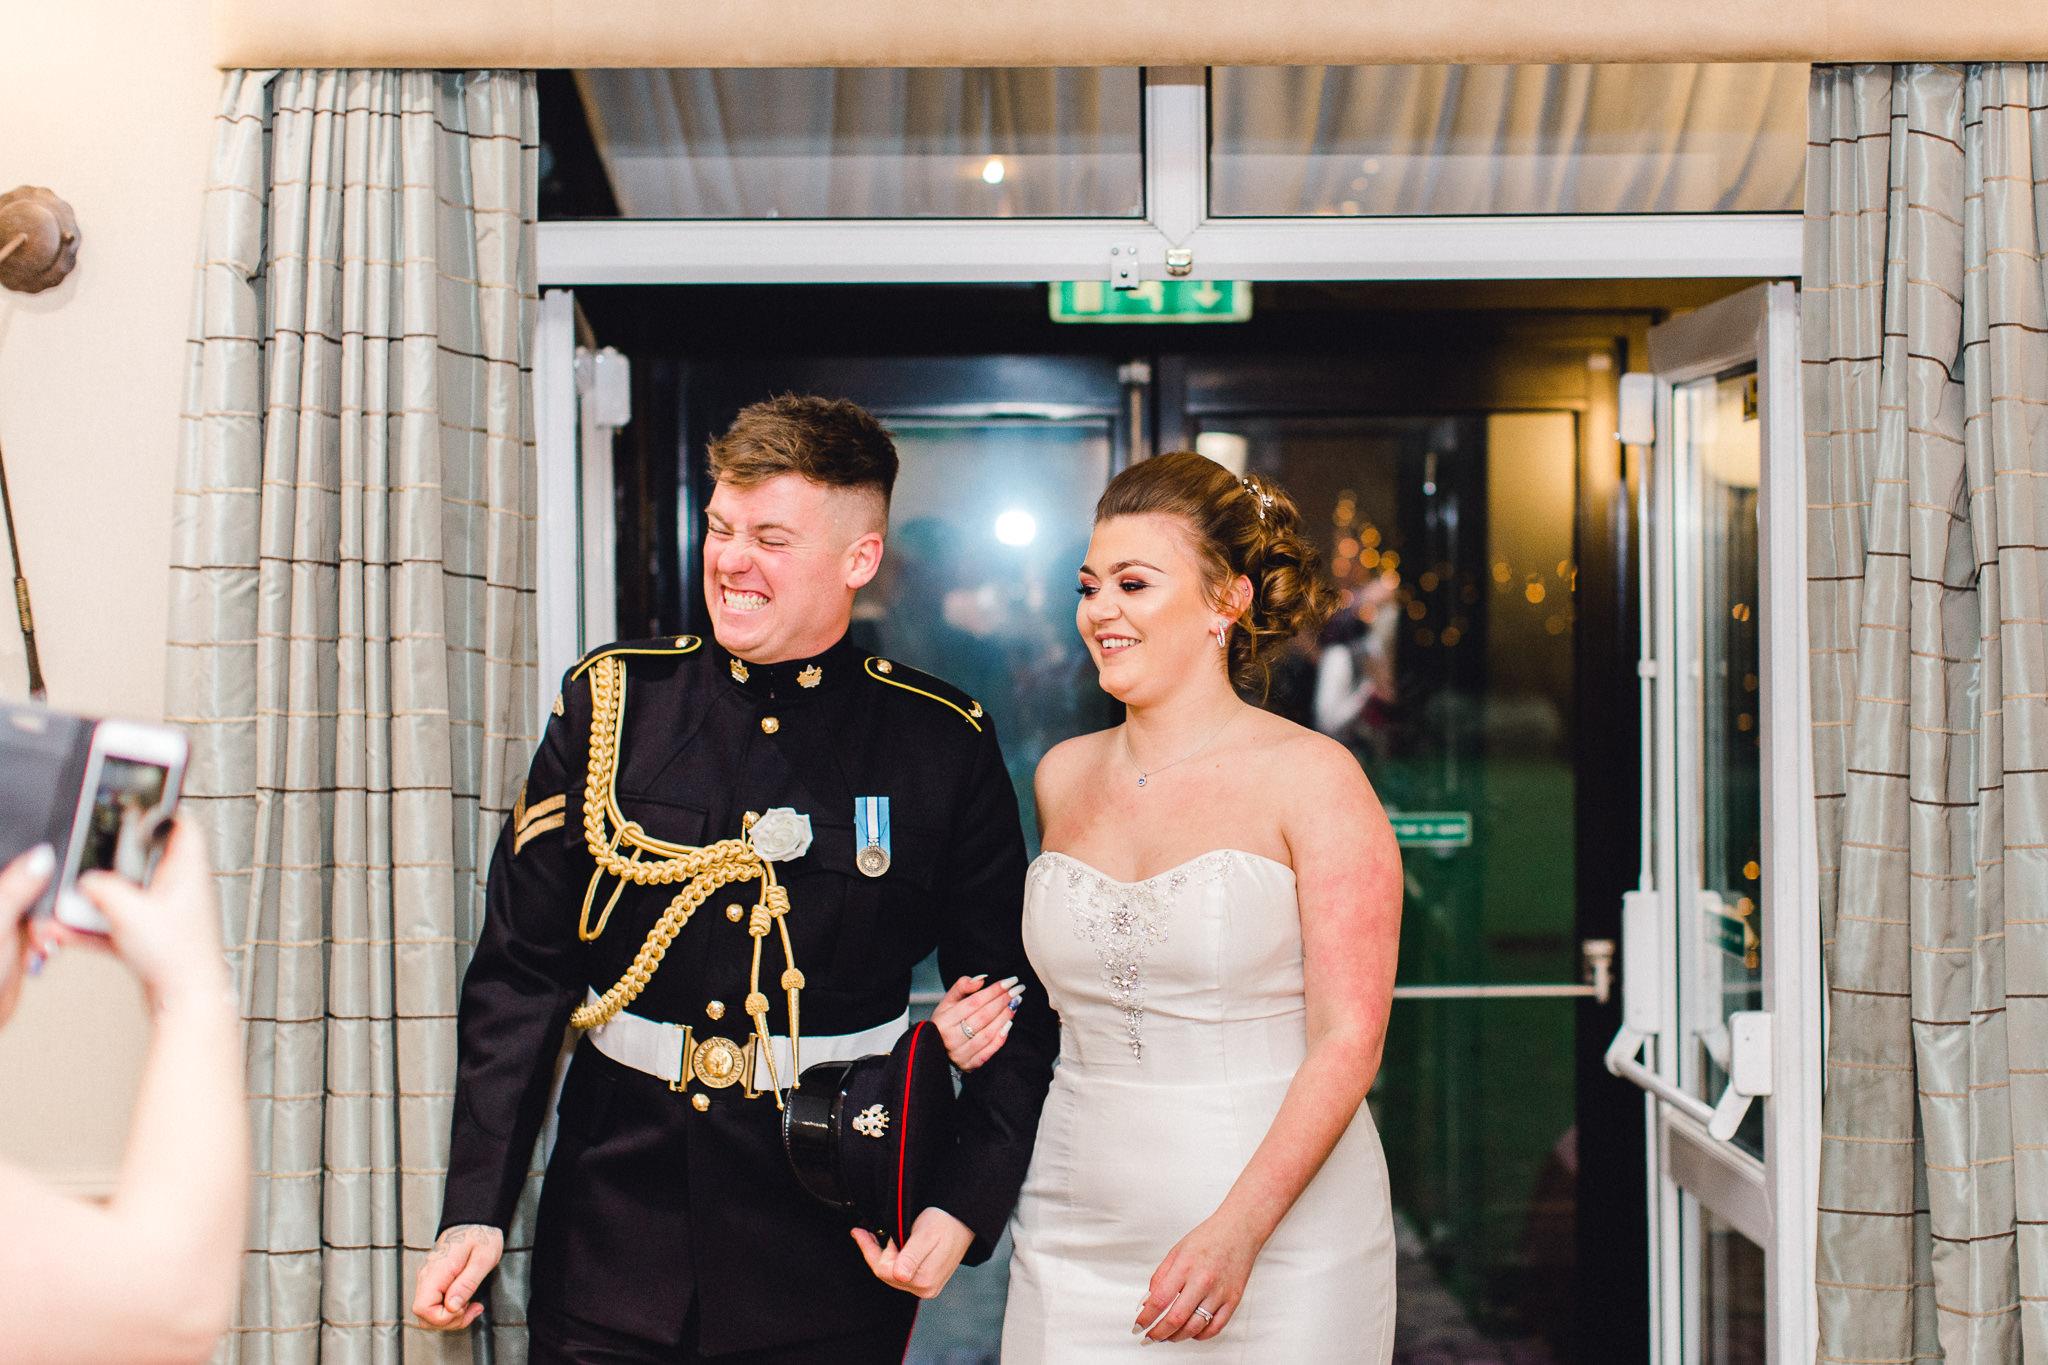 Mollingtonbanastre_wedding-16.jpg